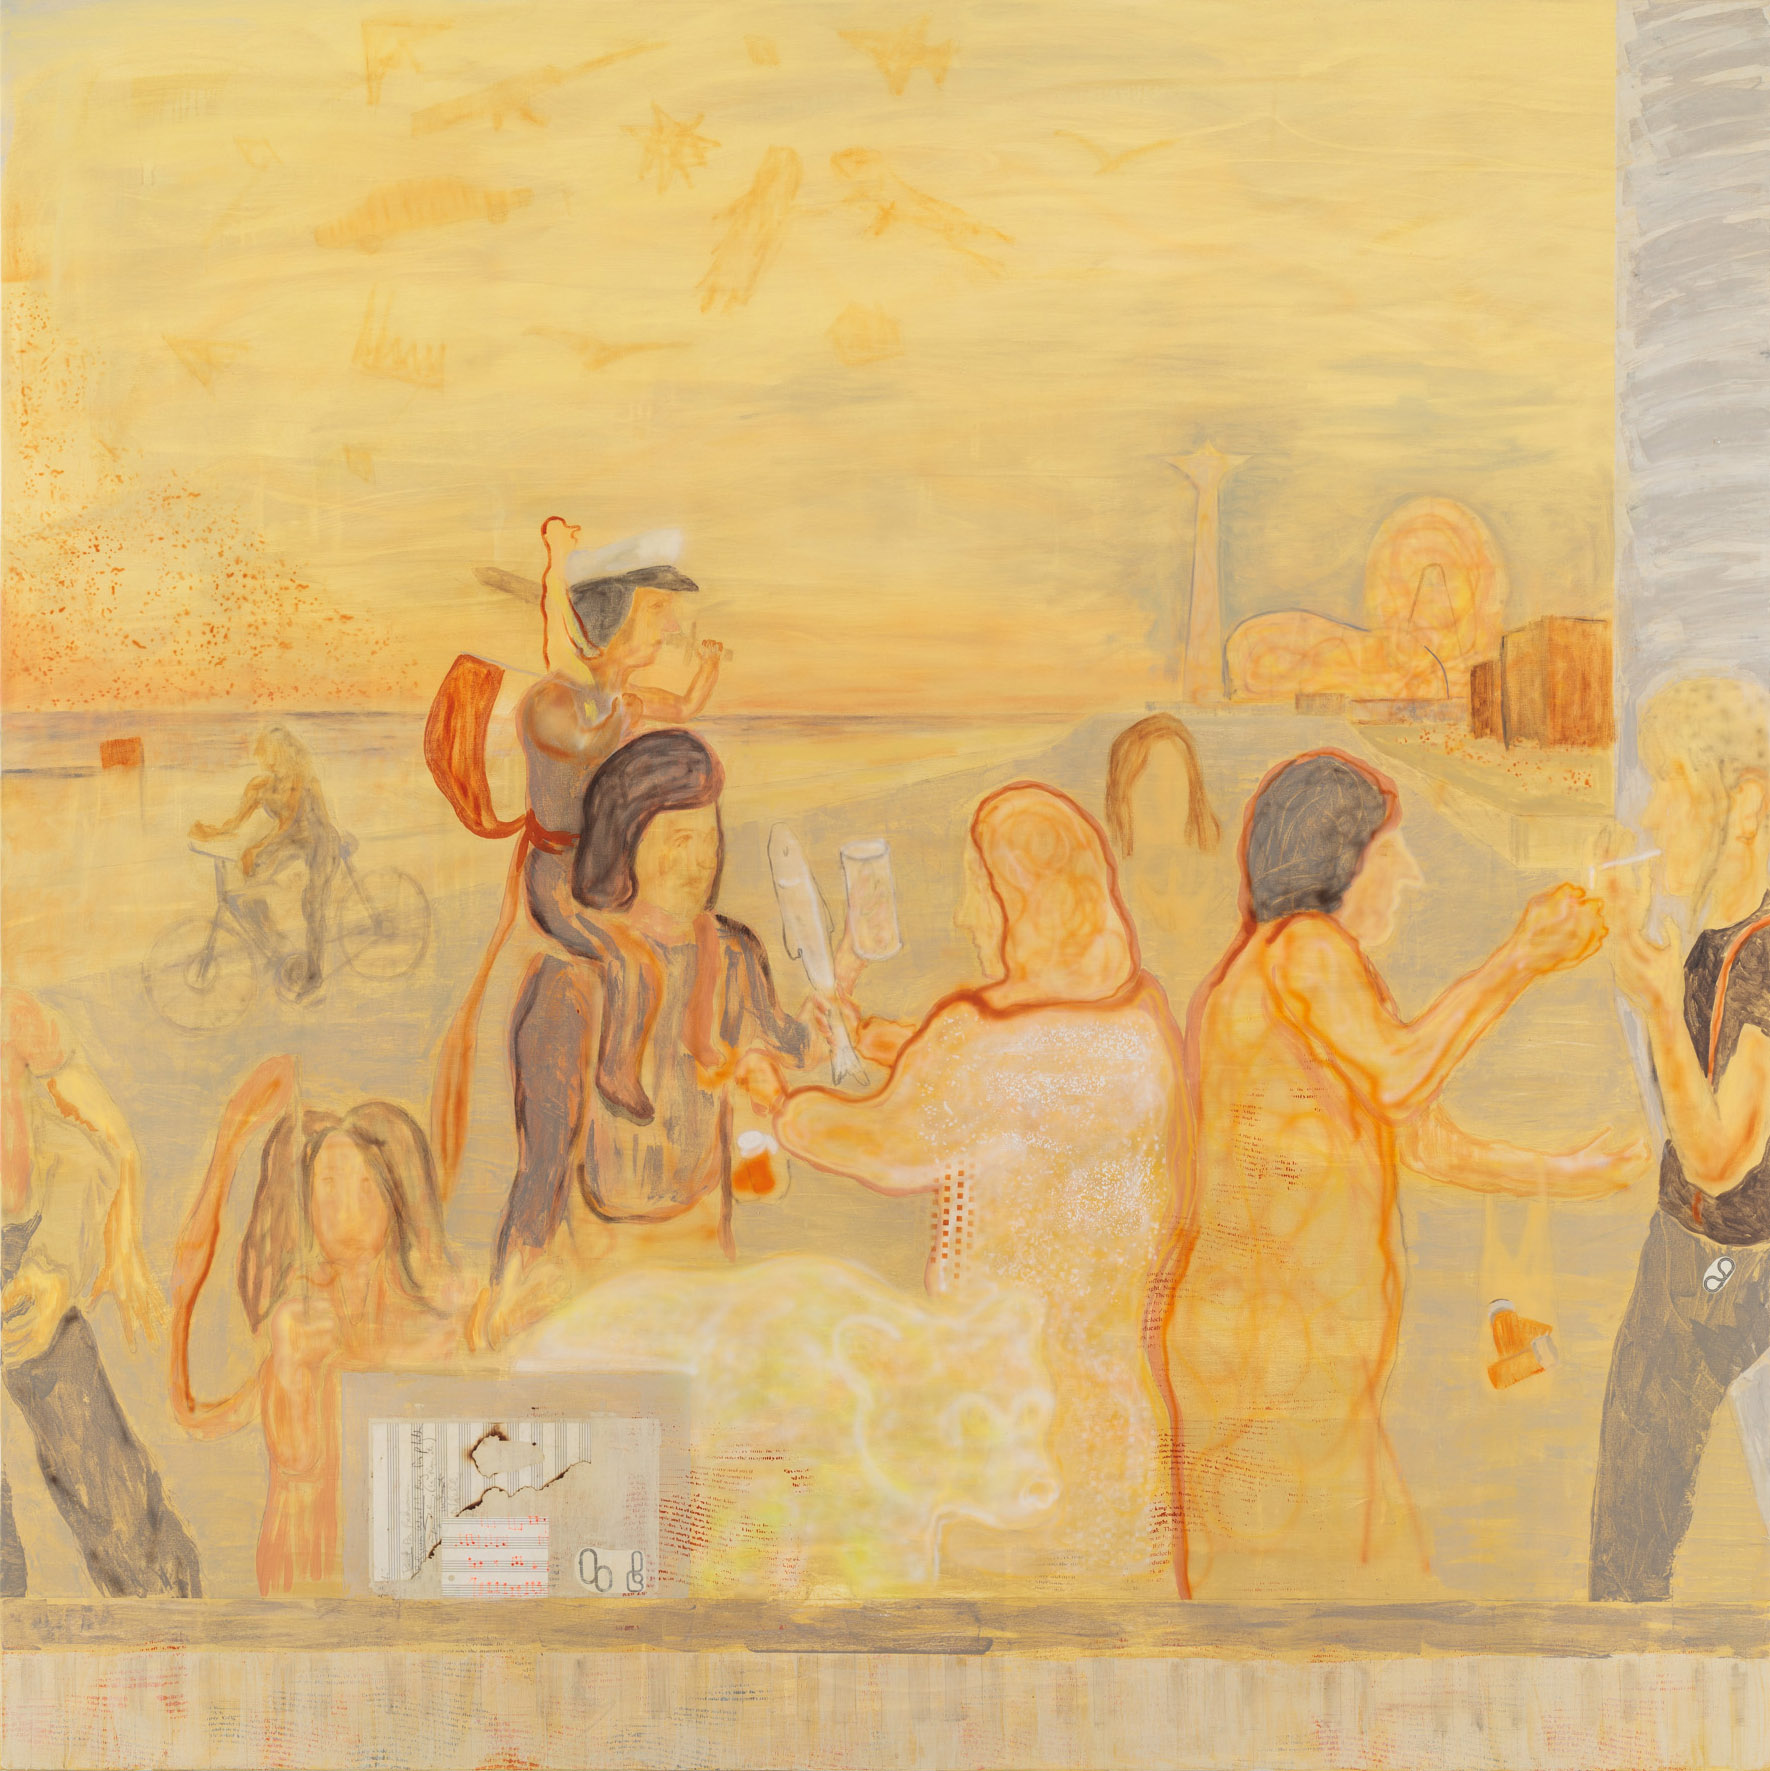 "Babushkas Sell Pills At Brighton, 72"" x 72"", Oil, Screenprint, Acrylic, and Airbrush on Canvas, 2017."